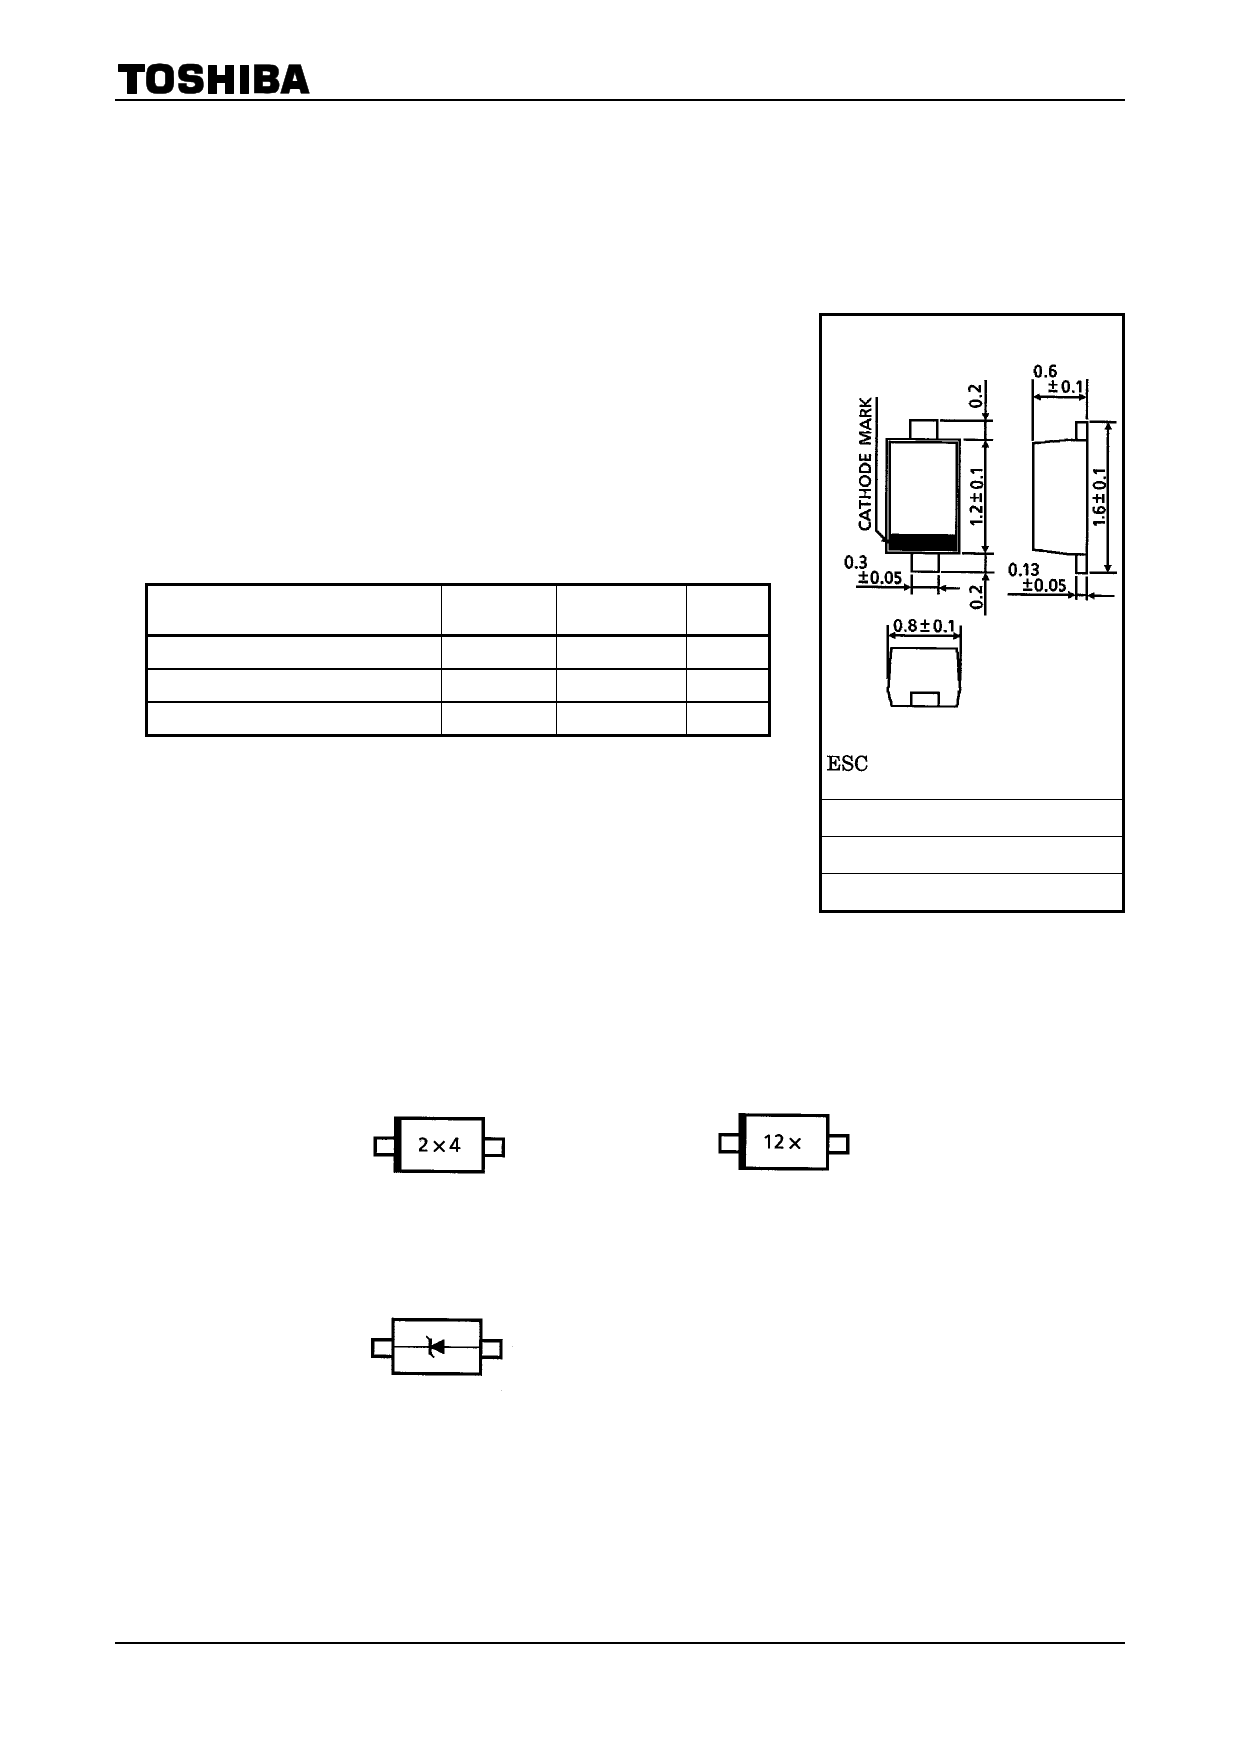 015AZ2.7 datasheet